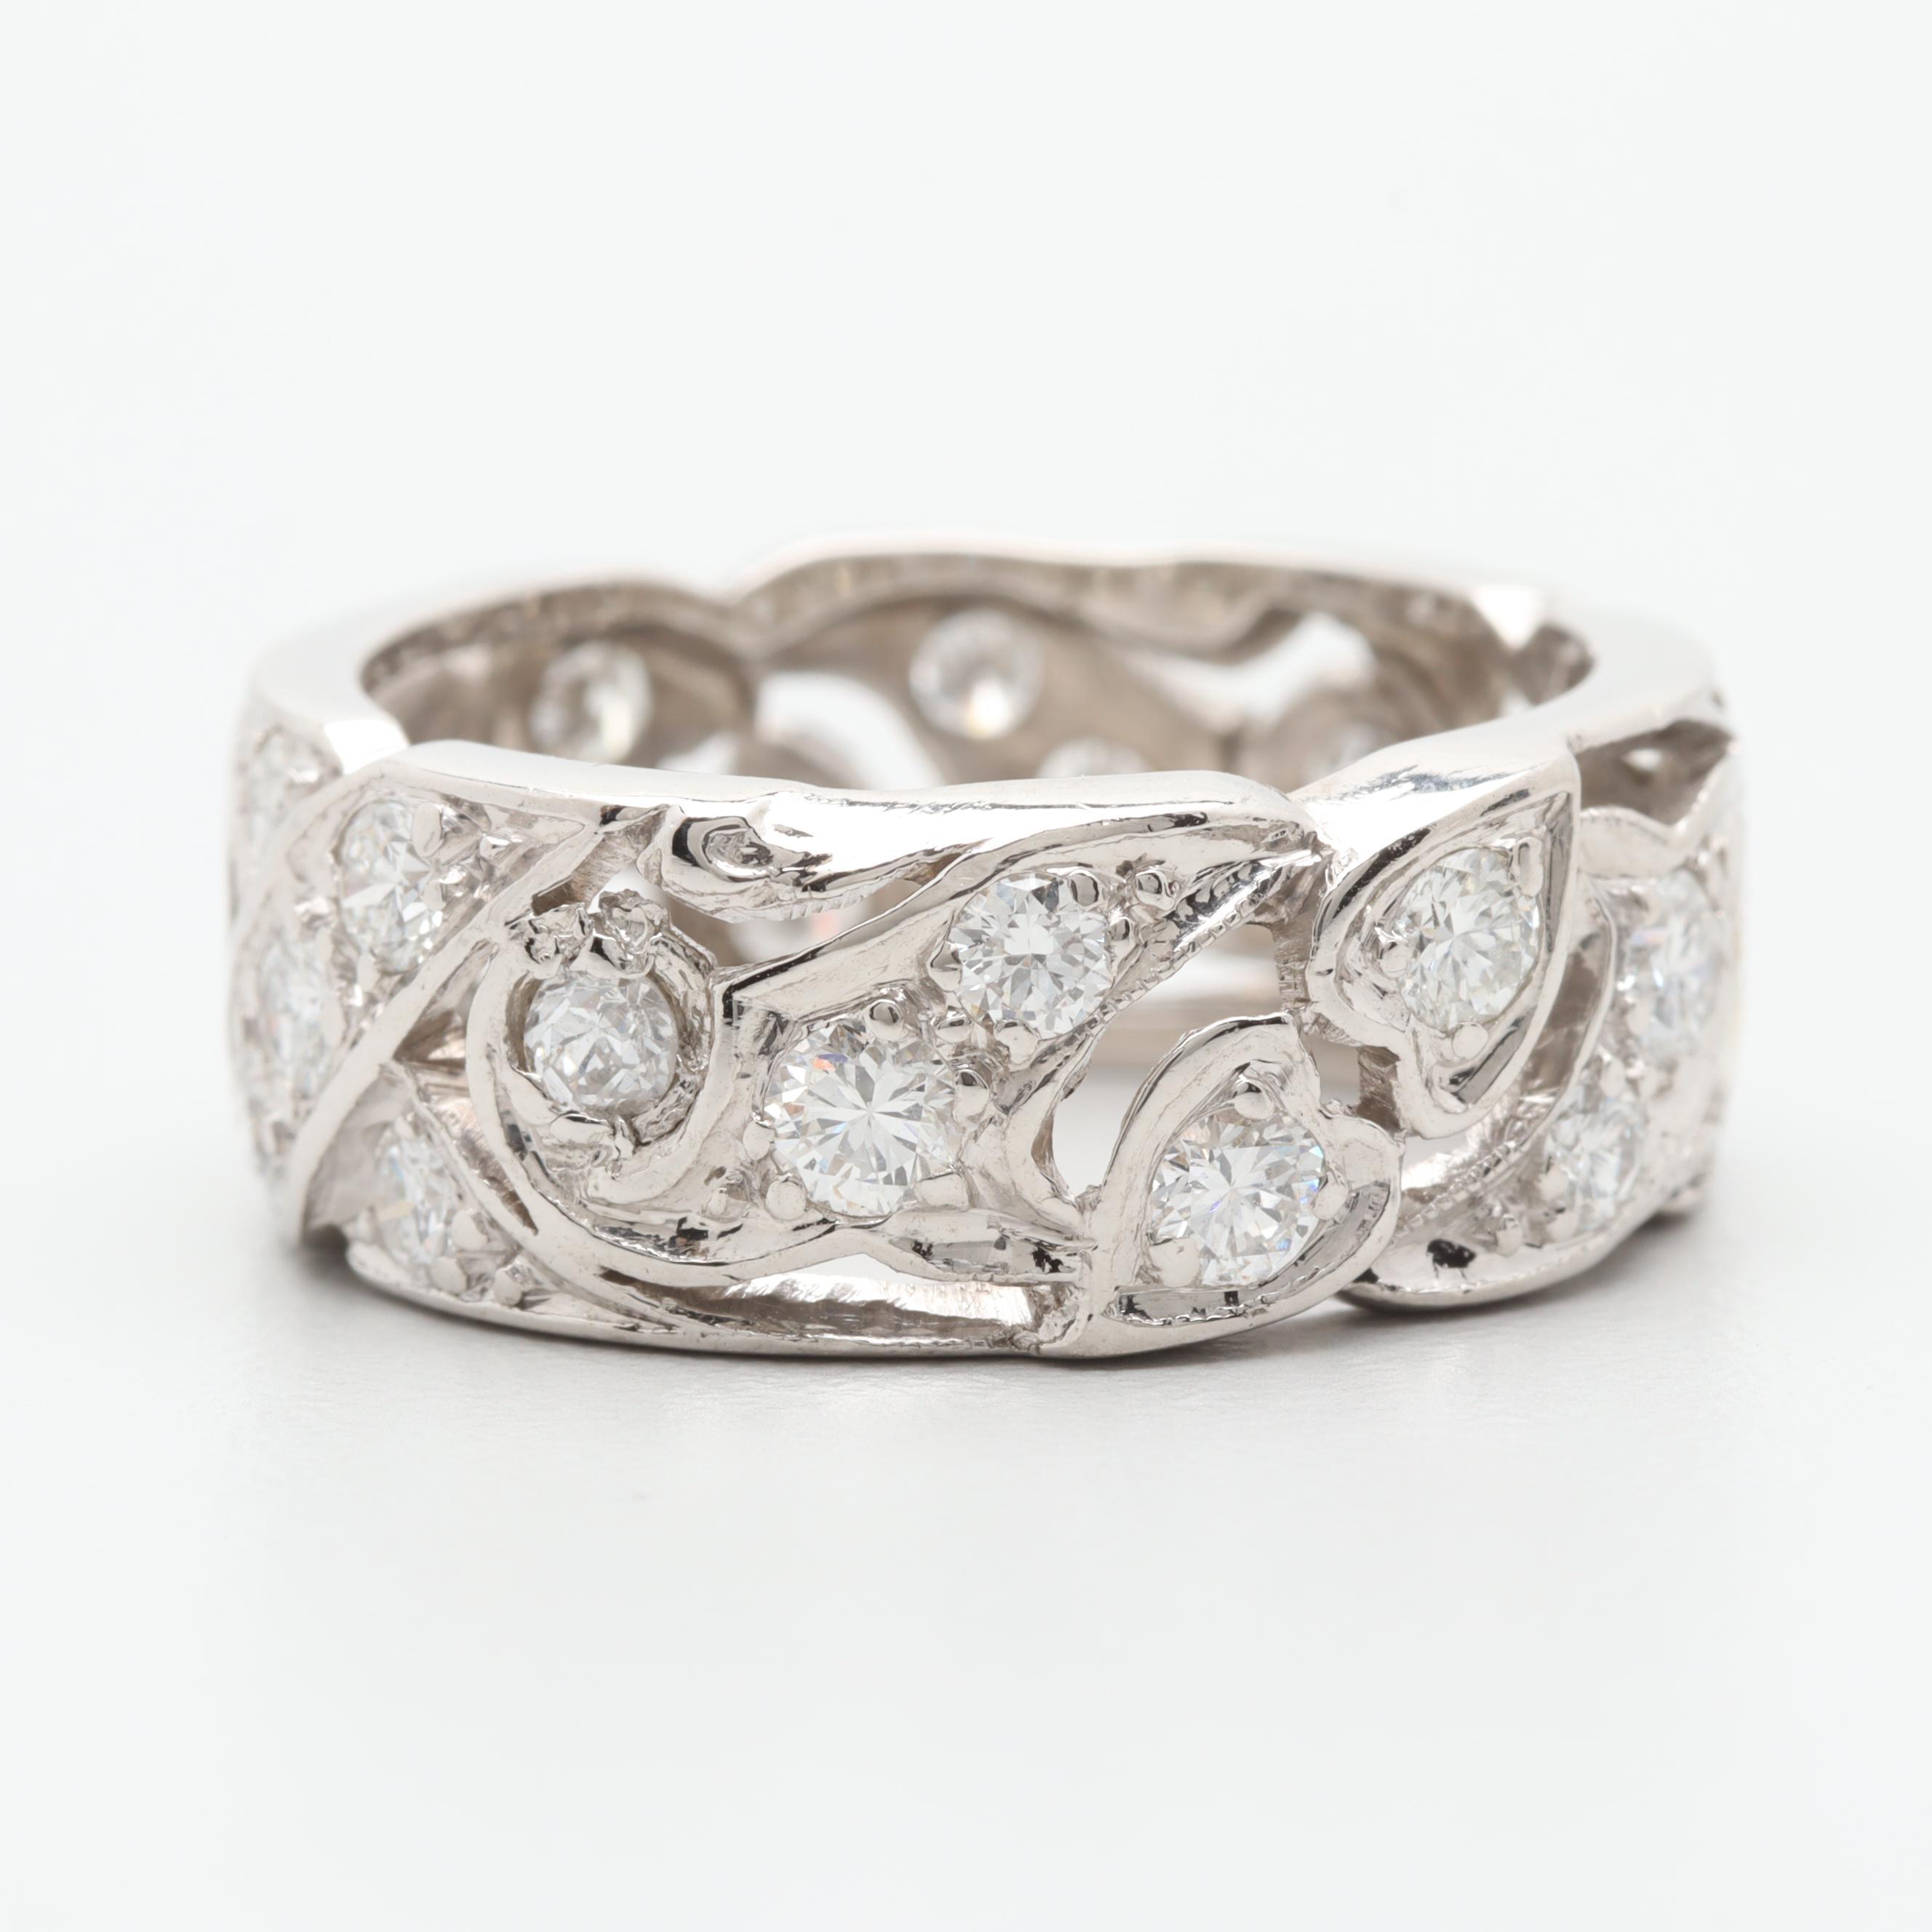 Platinum 1.54 CTW Diamond Ring Band